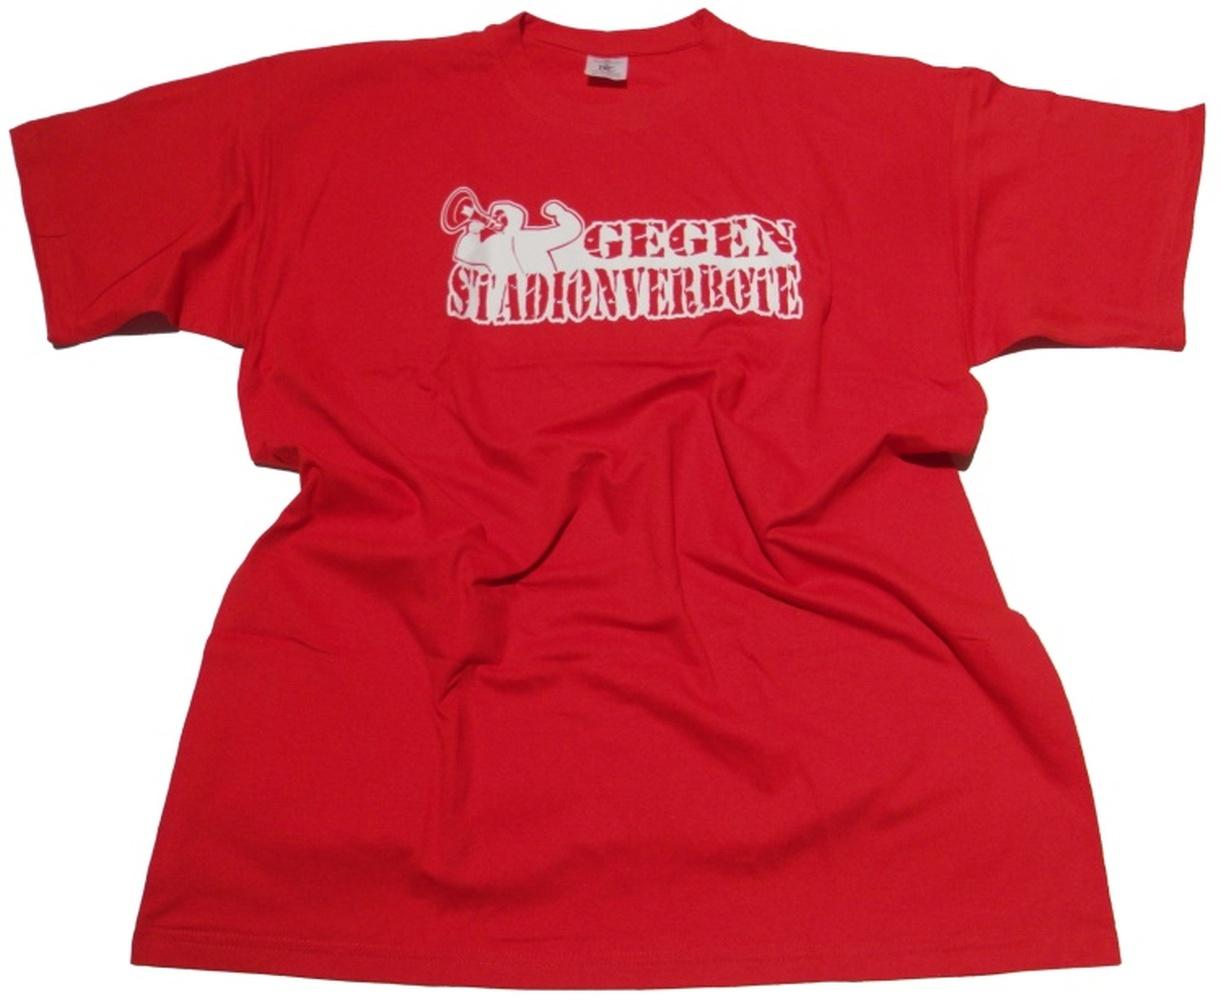 T-Shirt Gegen Stadionverbote Megaphone 2